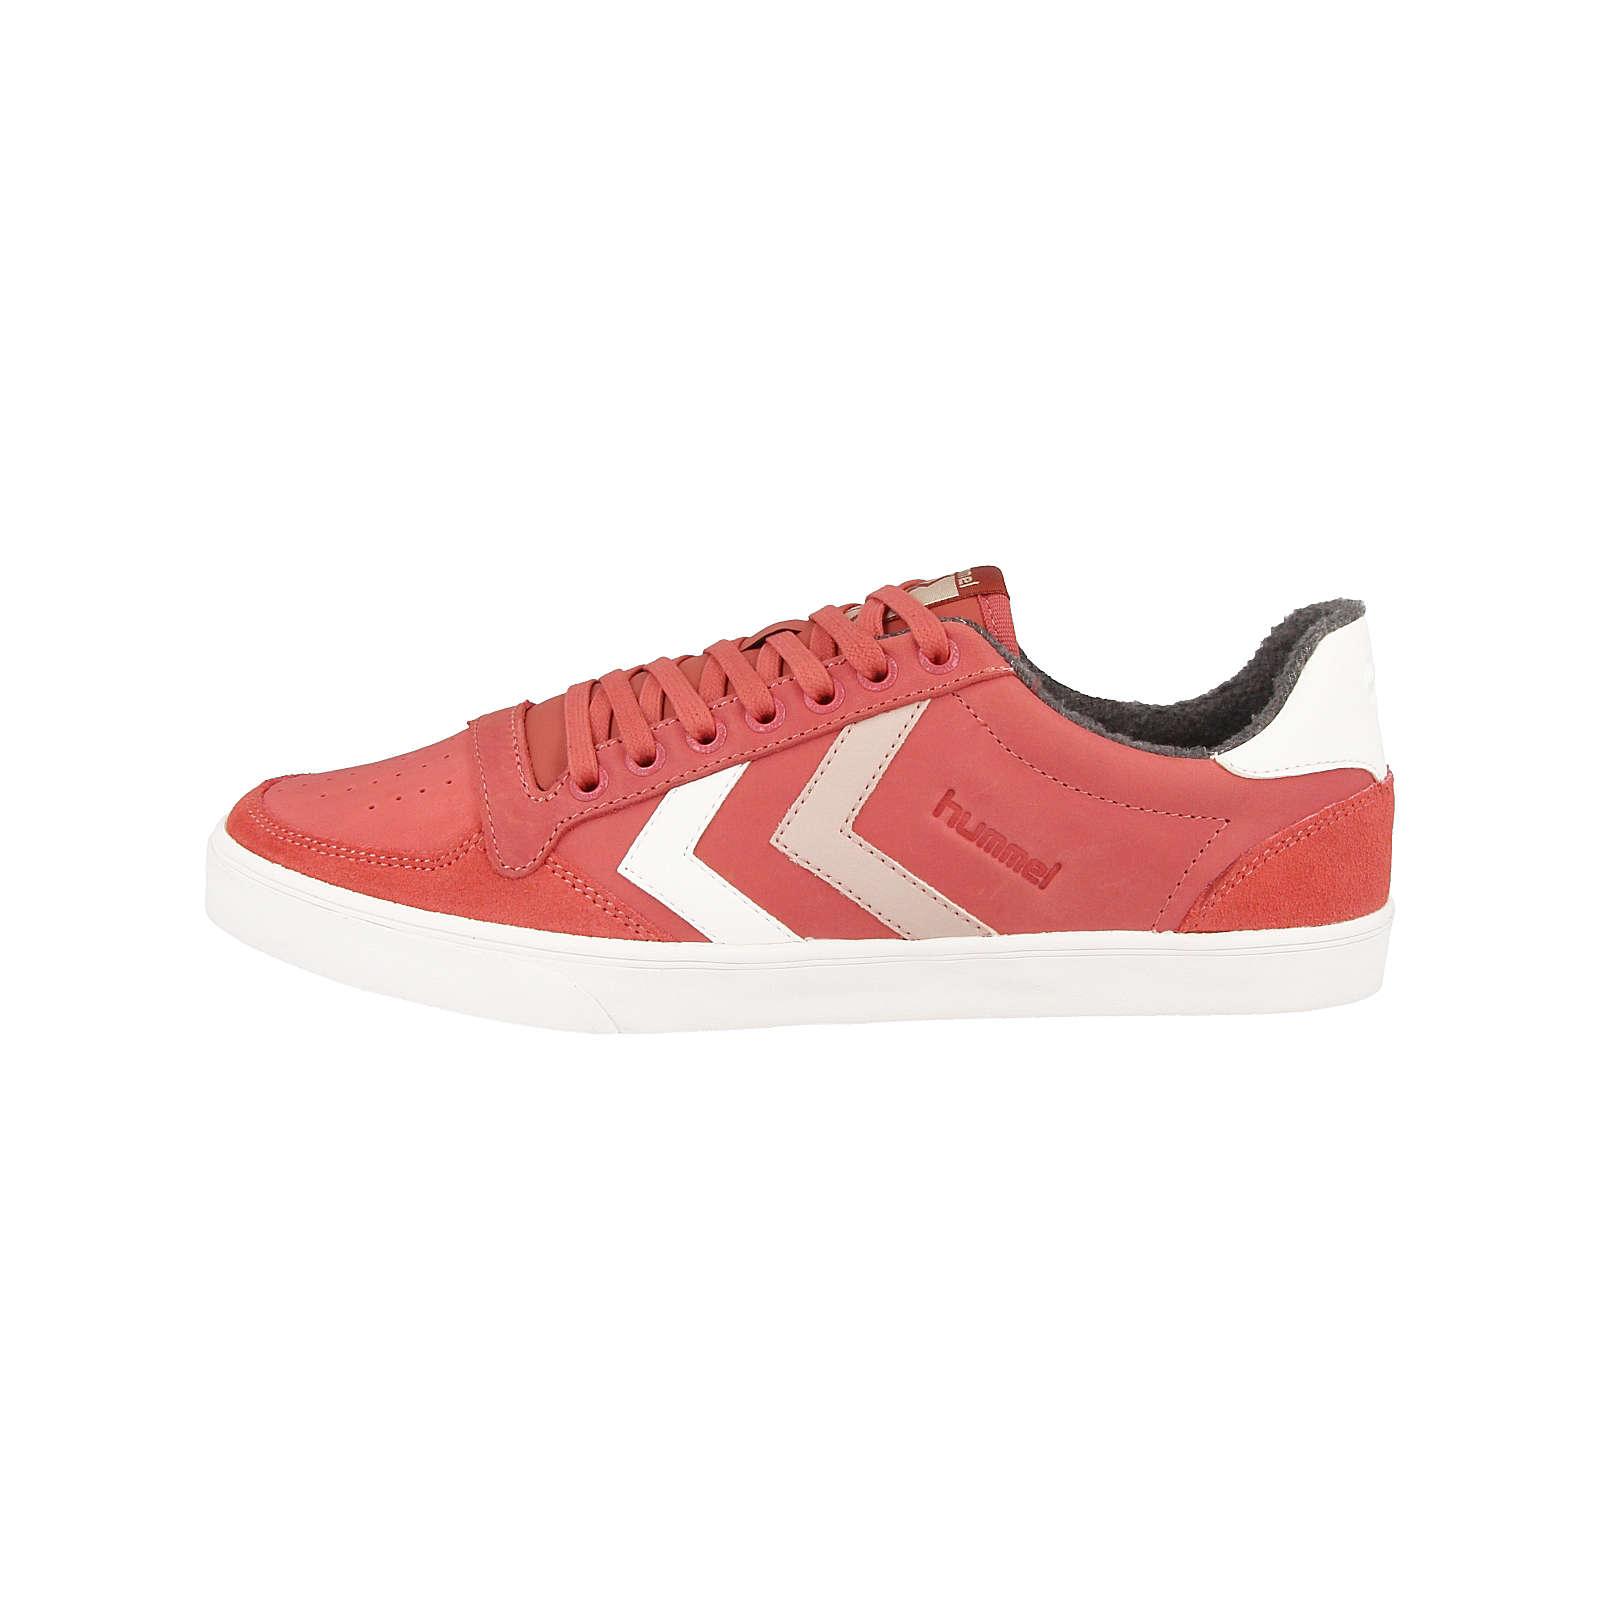 hummel Sneakers Low Stadil Duo Oiled rot Herren Gr. 46